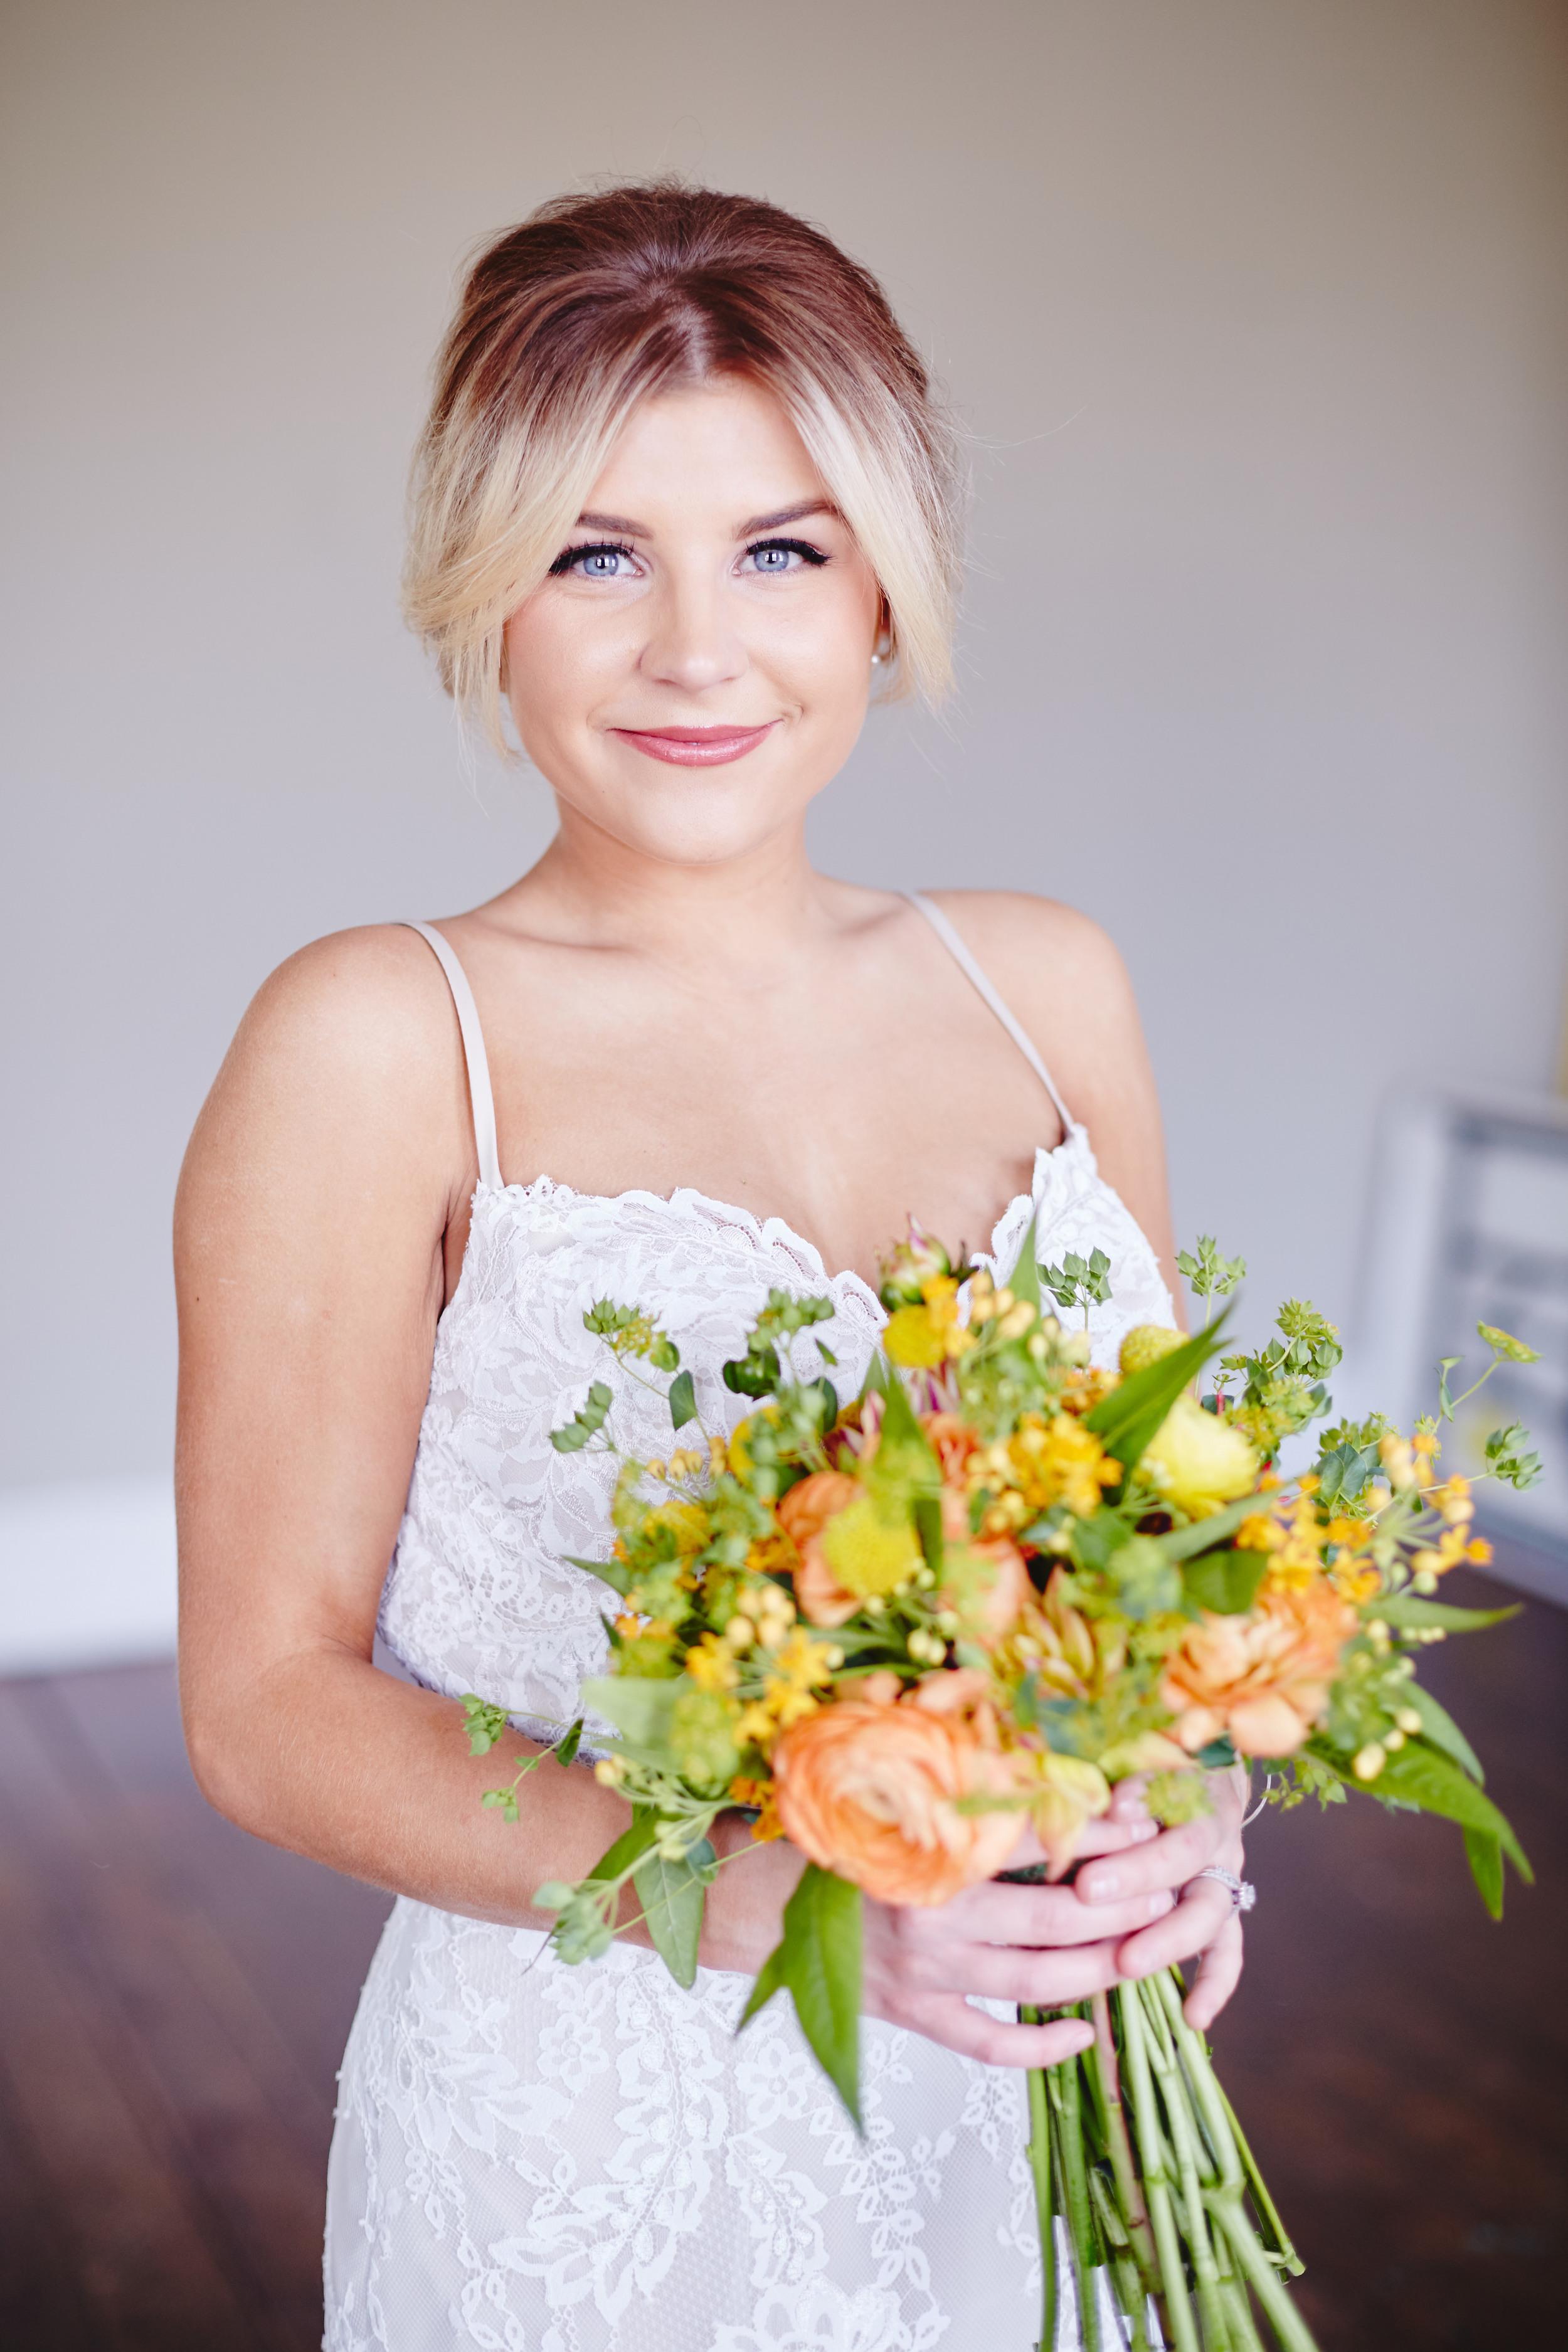 Styled_Session_Becca_Bridal_Portraits_Sarah_Tau_Photography_HOB_Studio_285 96.jpg